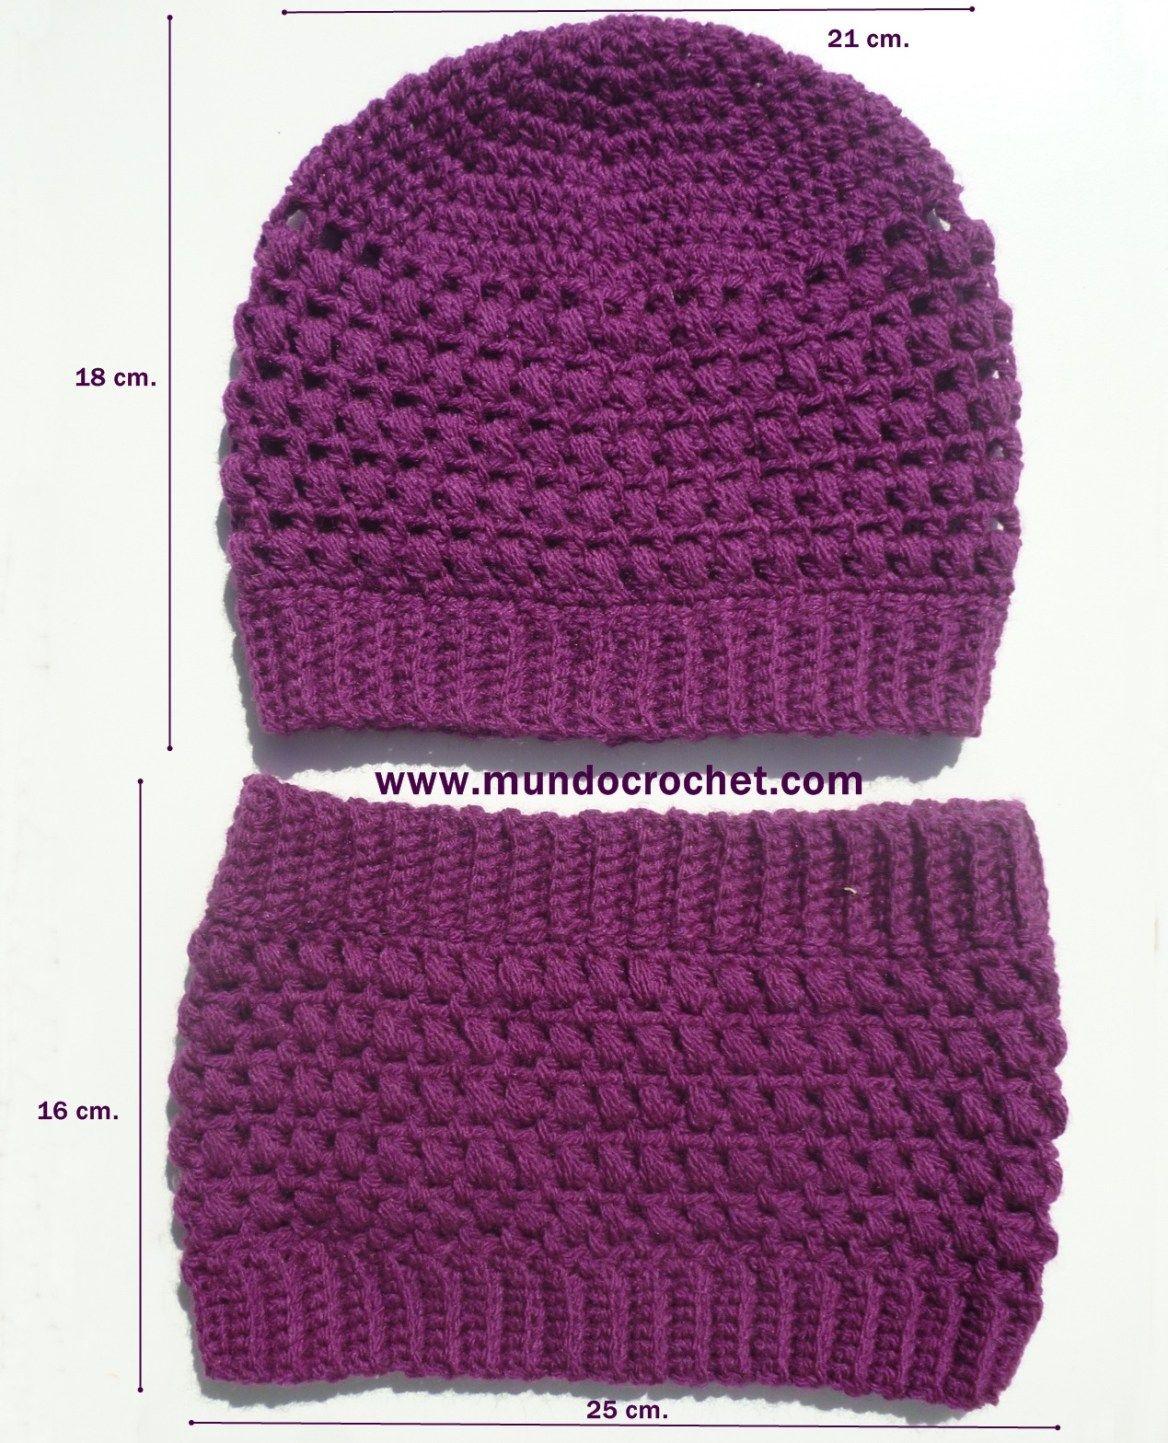 Patron gorro y cuello en punto puff a crochet o ganchillo | Crochet ...